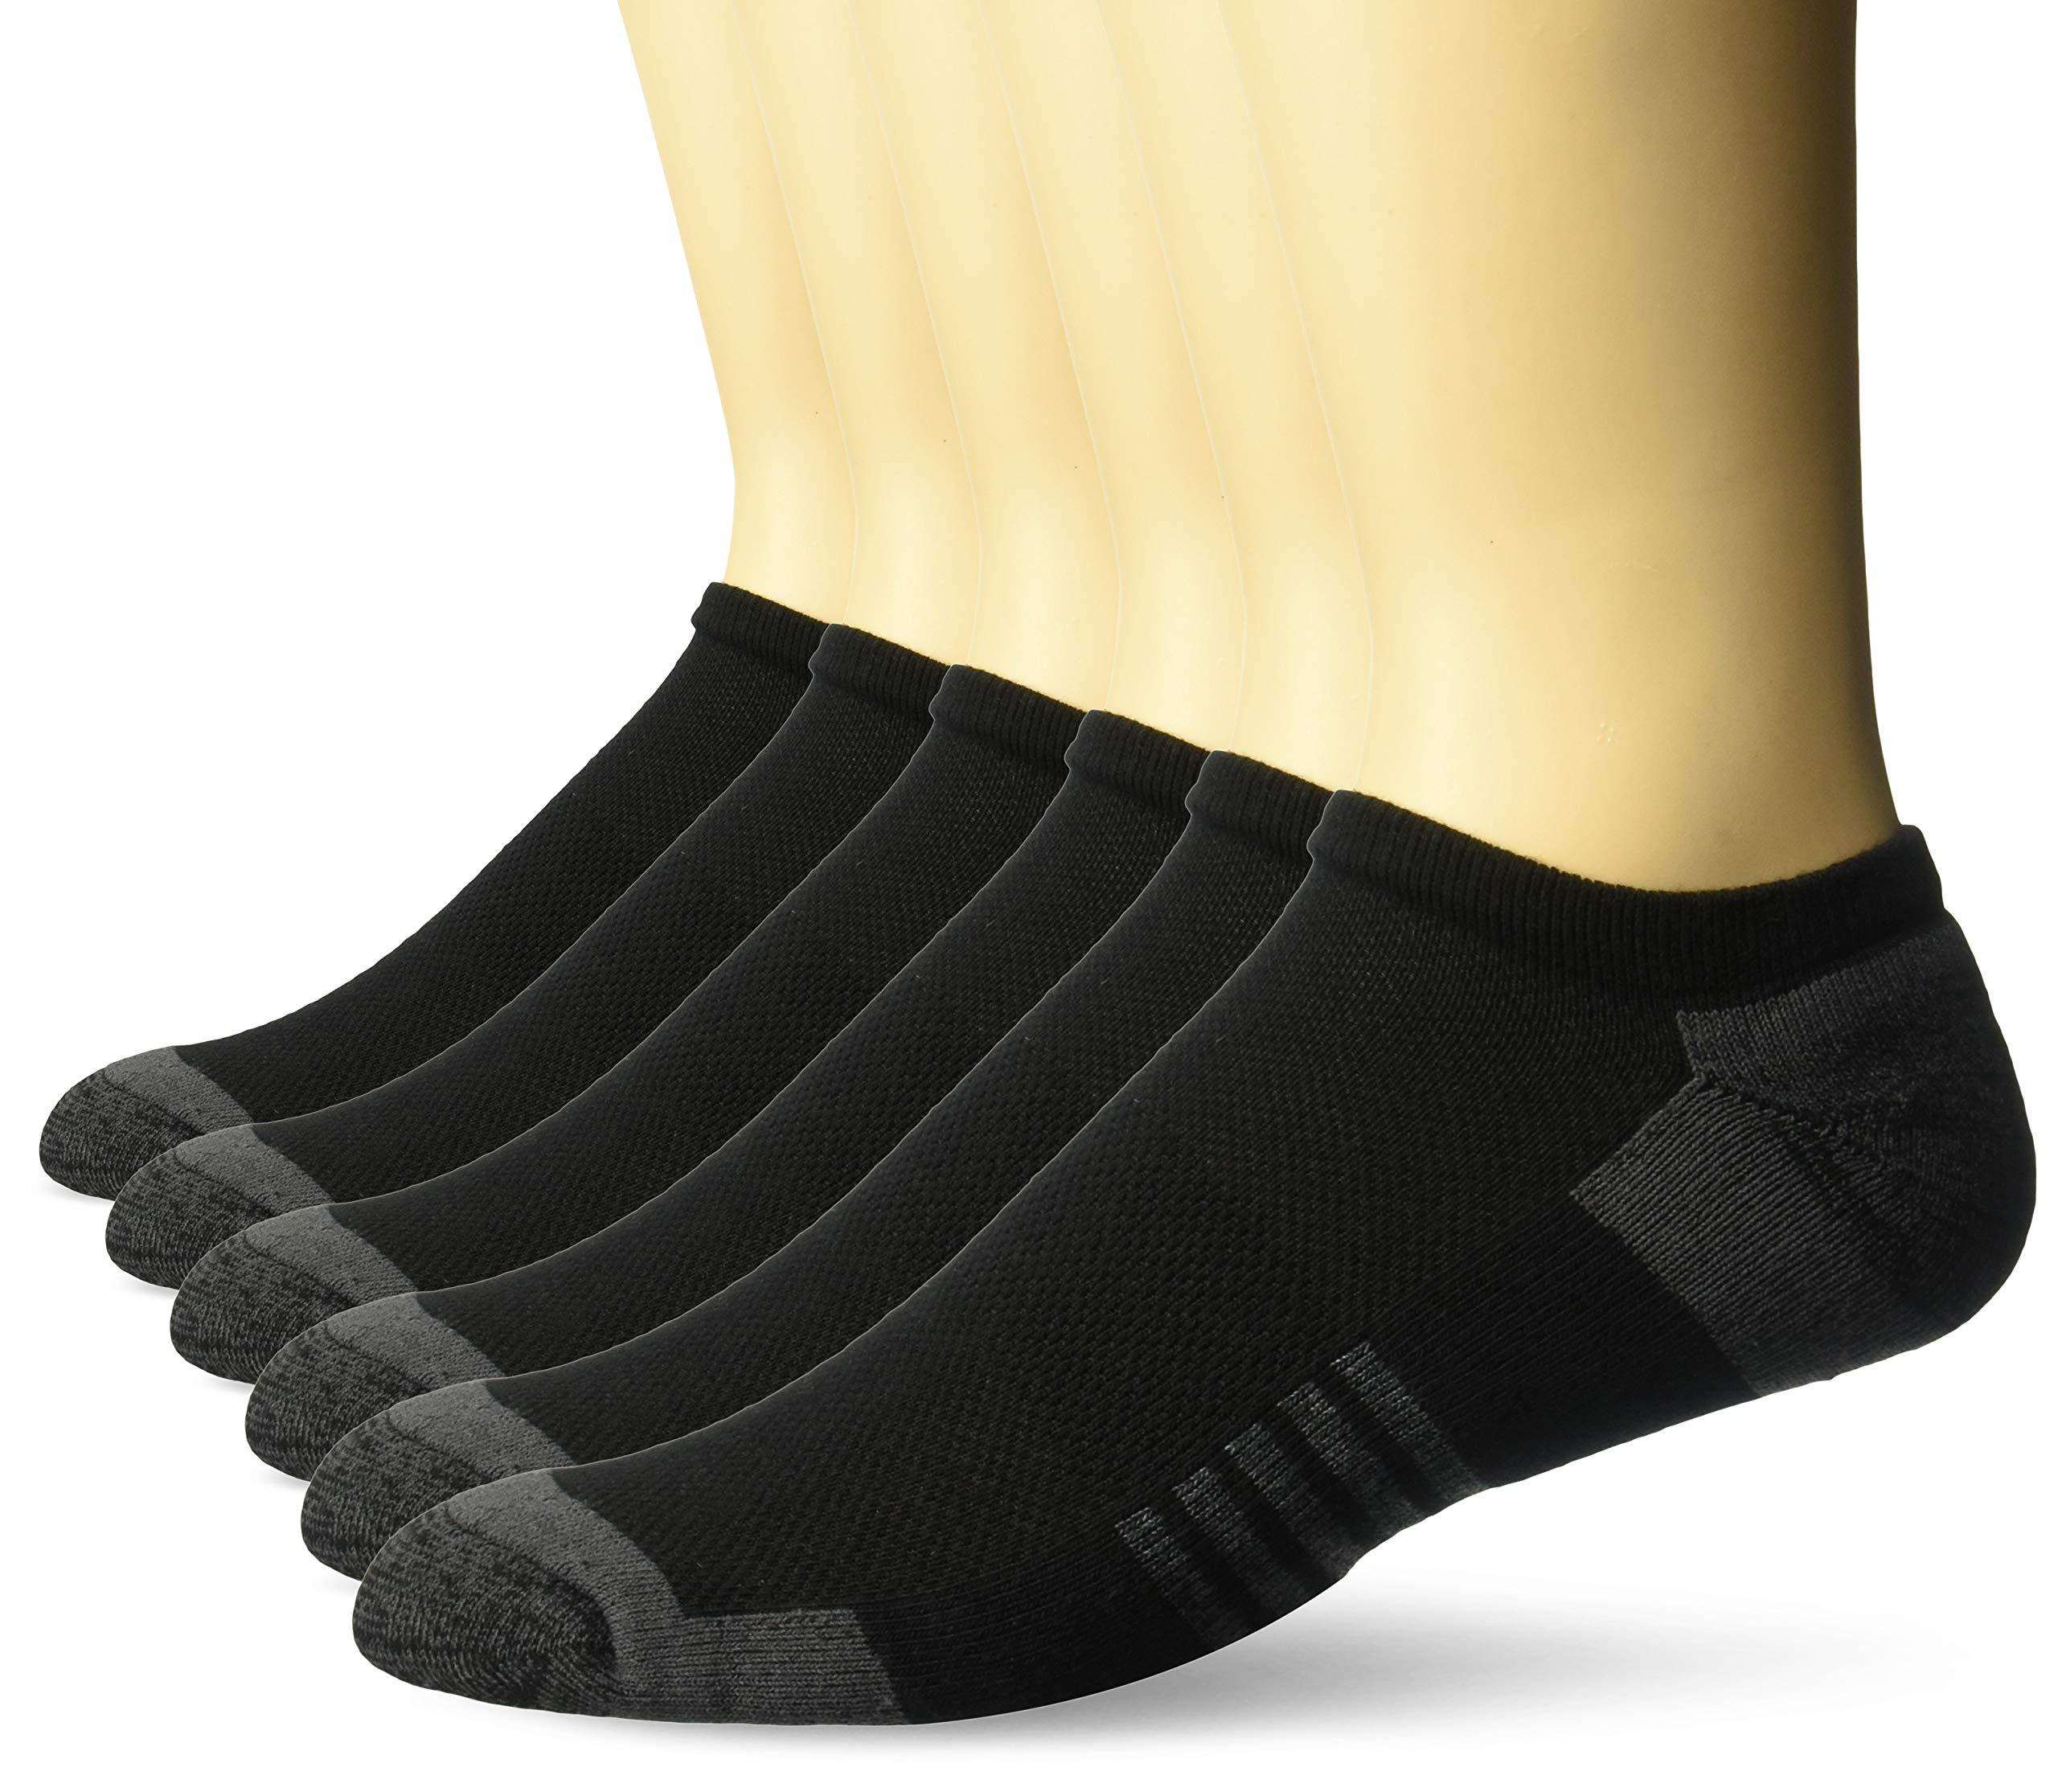 Amazon Essentials Men's 6-Pack Performance Cotton Cushioned Athletic No-Show Socks, Black, Shoe Size: 12-16